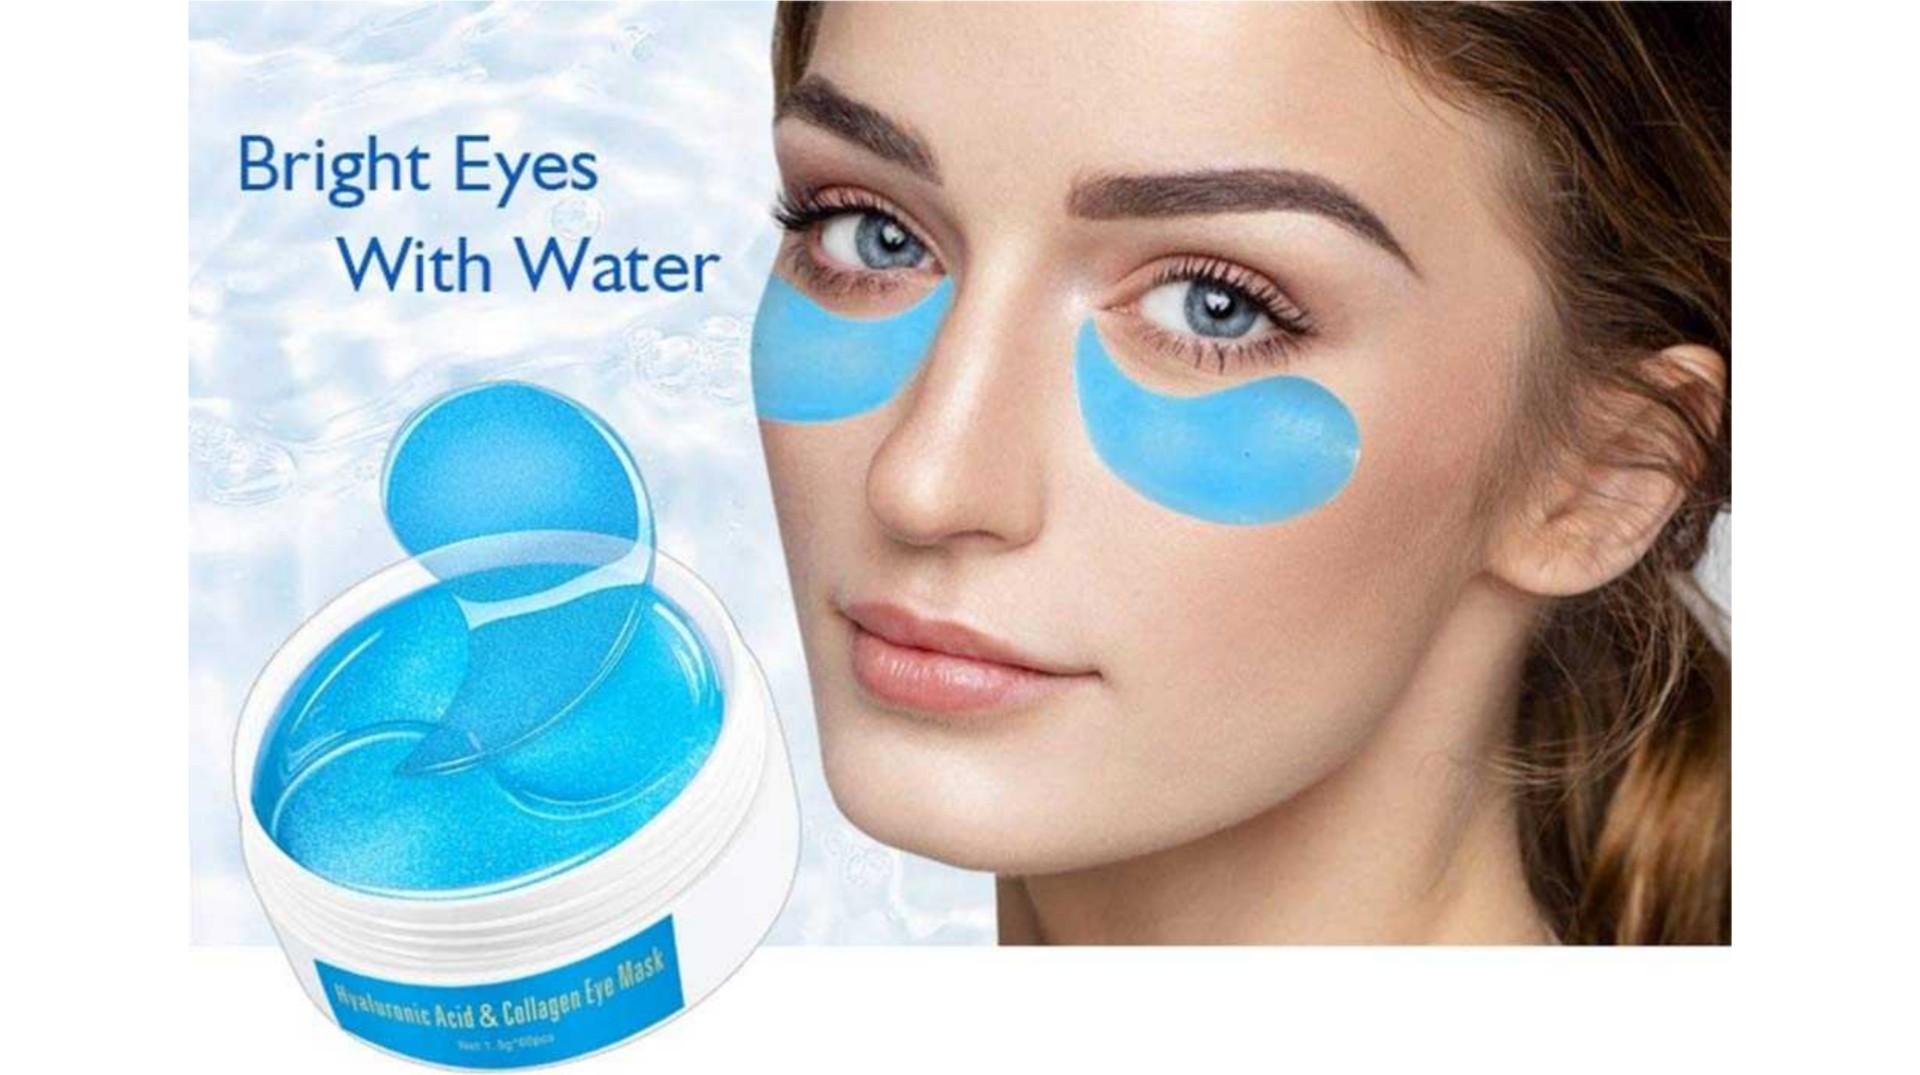 ماسک-زیر-چشم-هیالورونیک-اسید-آیچون-بیوتی-aichun-beauty